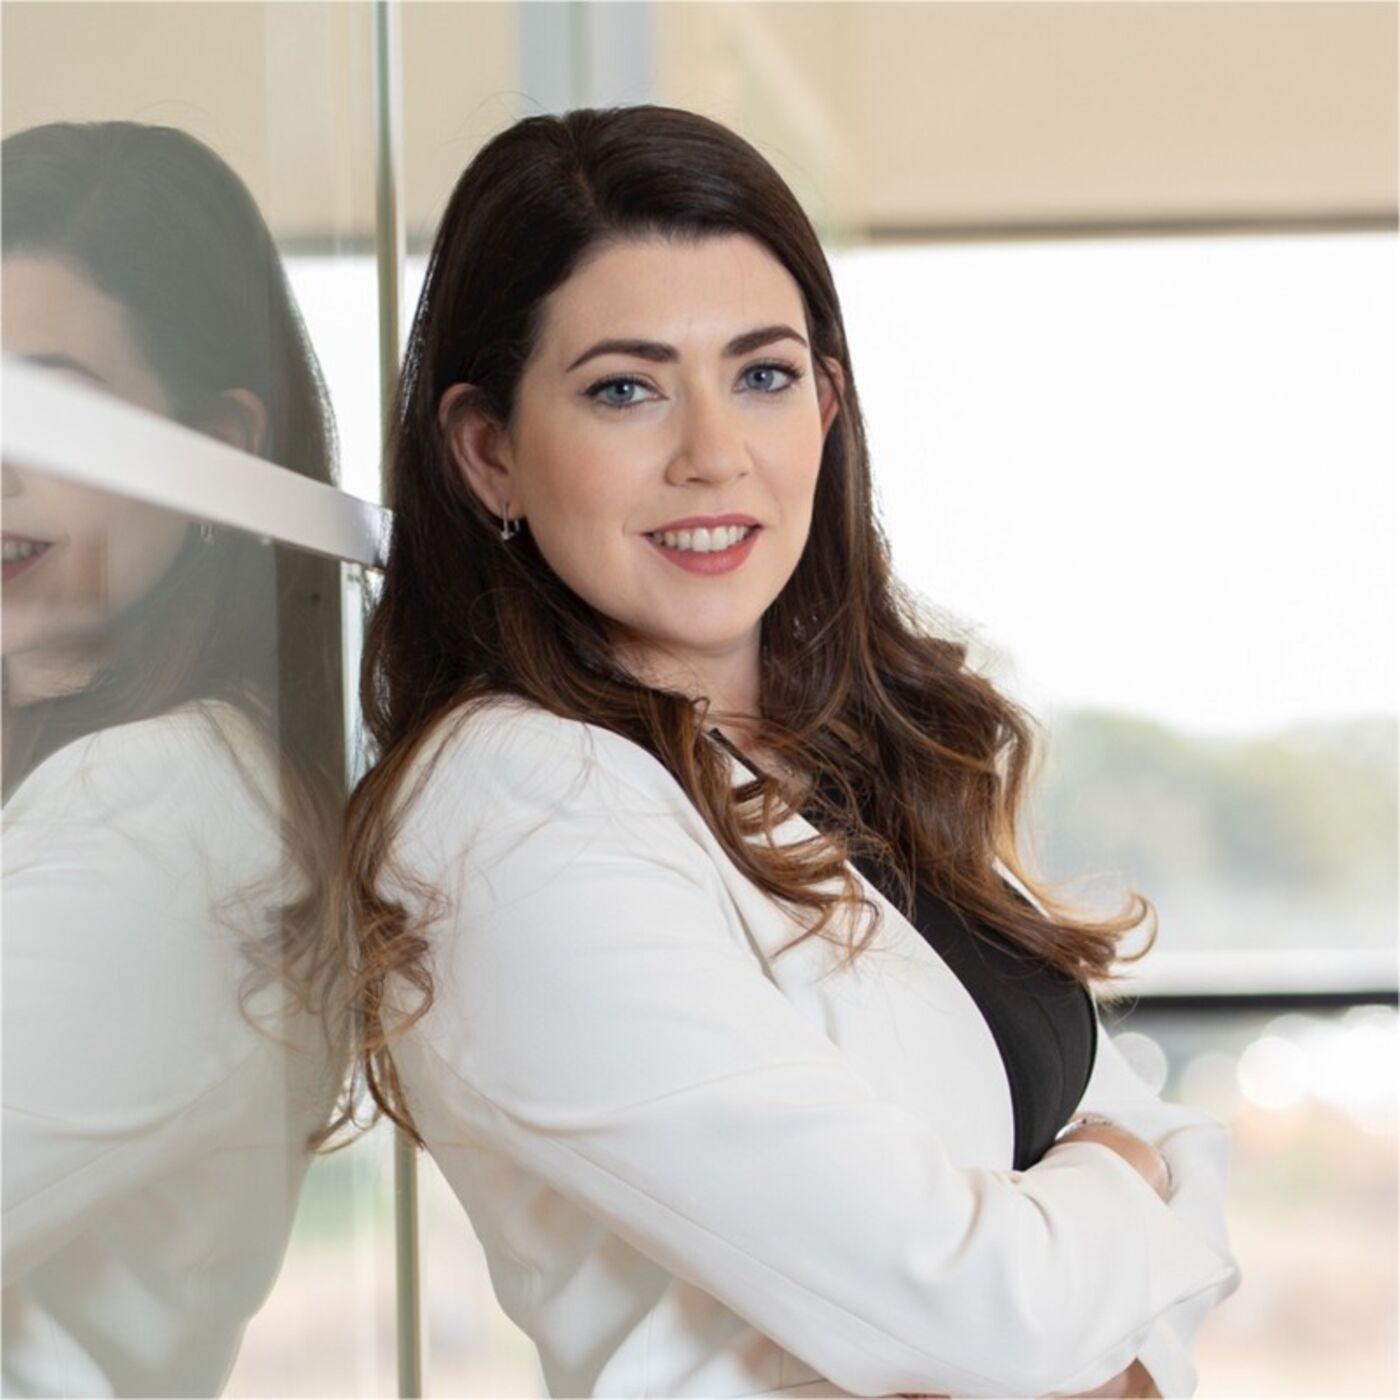 Customer Experience Superheroes - Series 2 Episode 4 - Dr Marina Shapira explains the impact of Covid-19 on online consumer behaviour